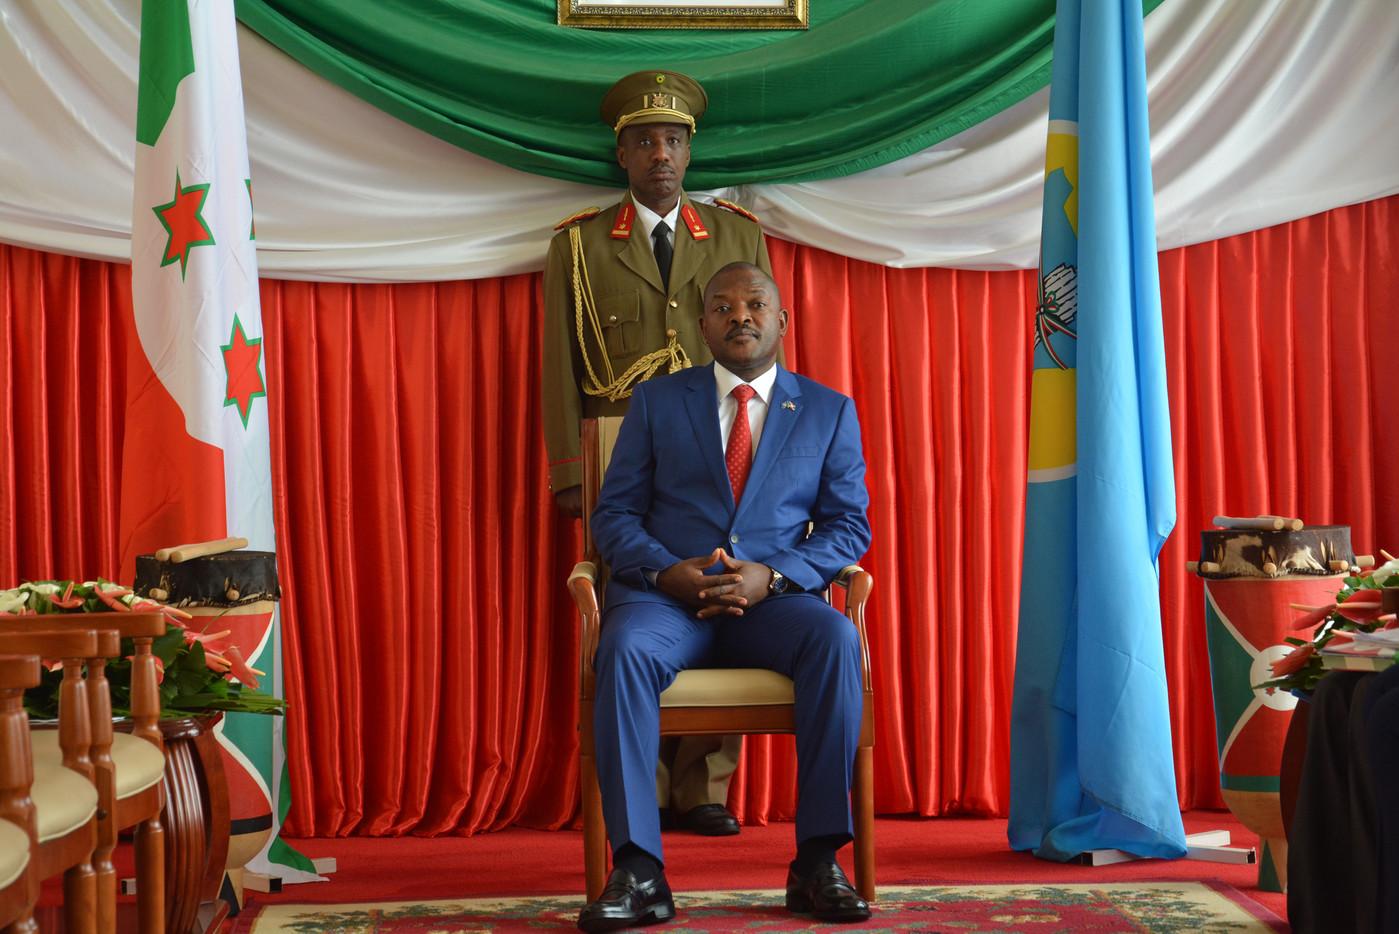 Le Président Pierre Nkurunziza à Bujumbura le 29 juin 2017.